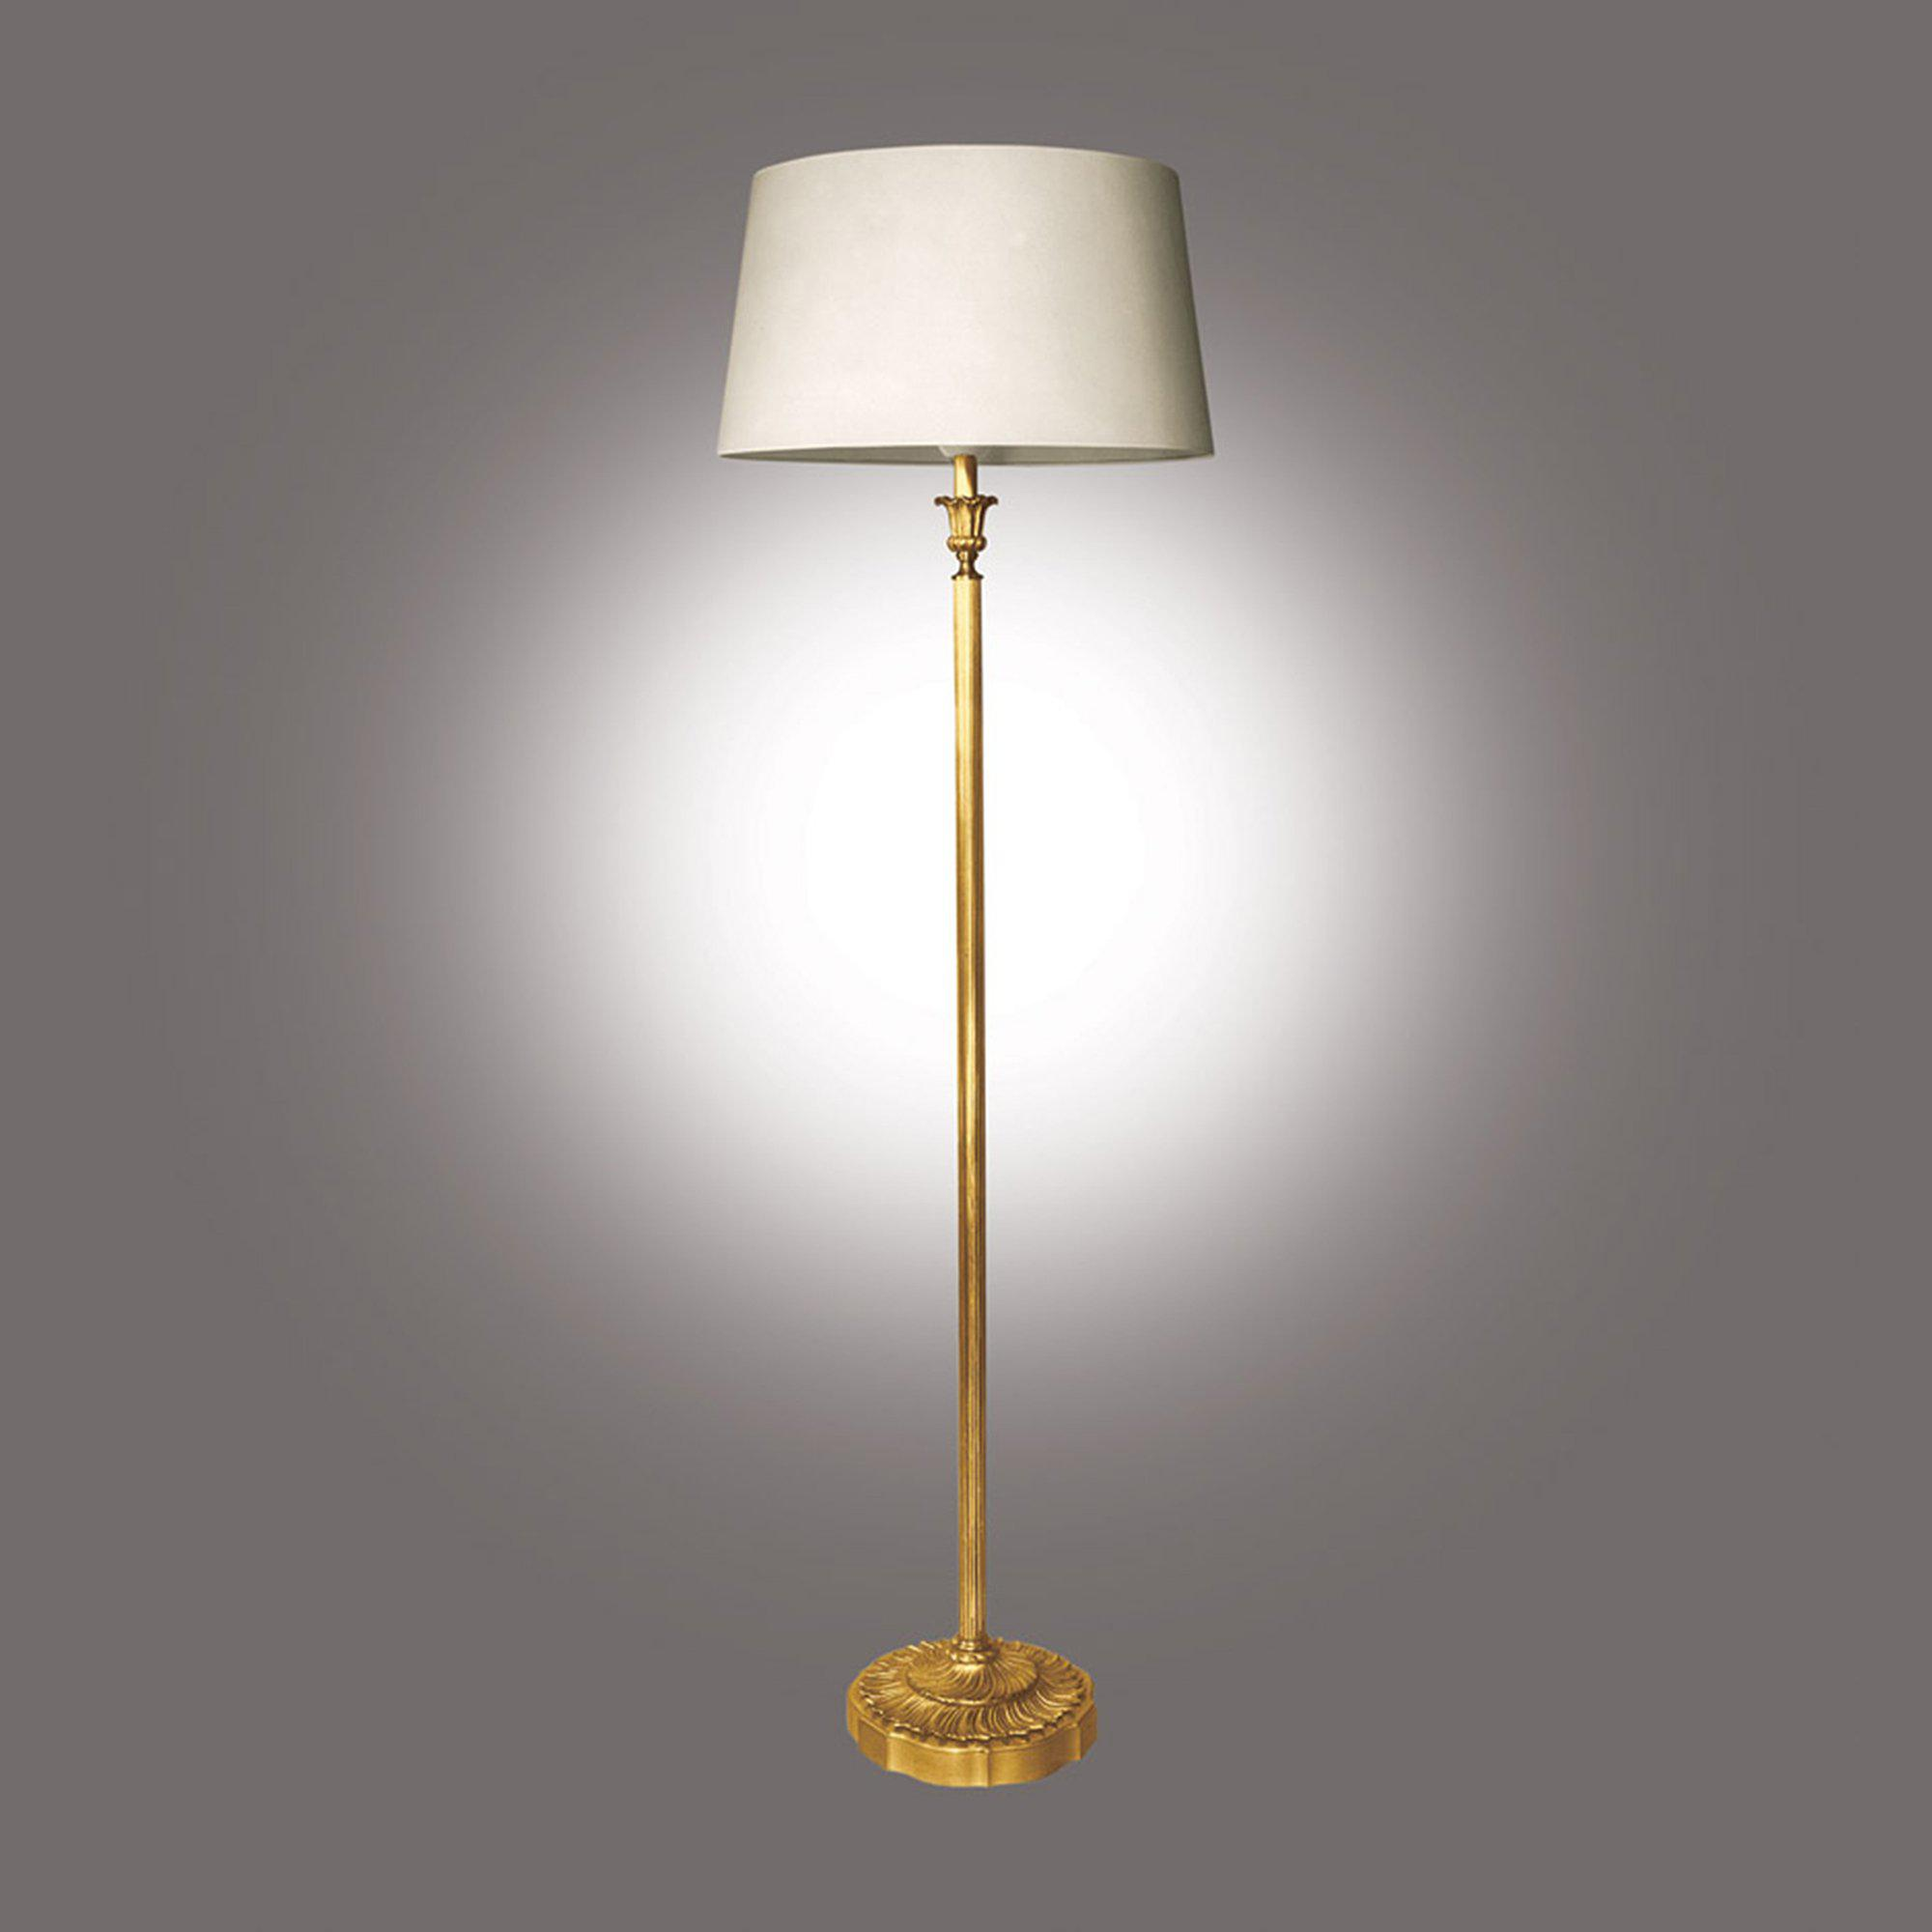 Louis XV floor lamp